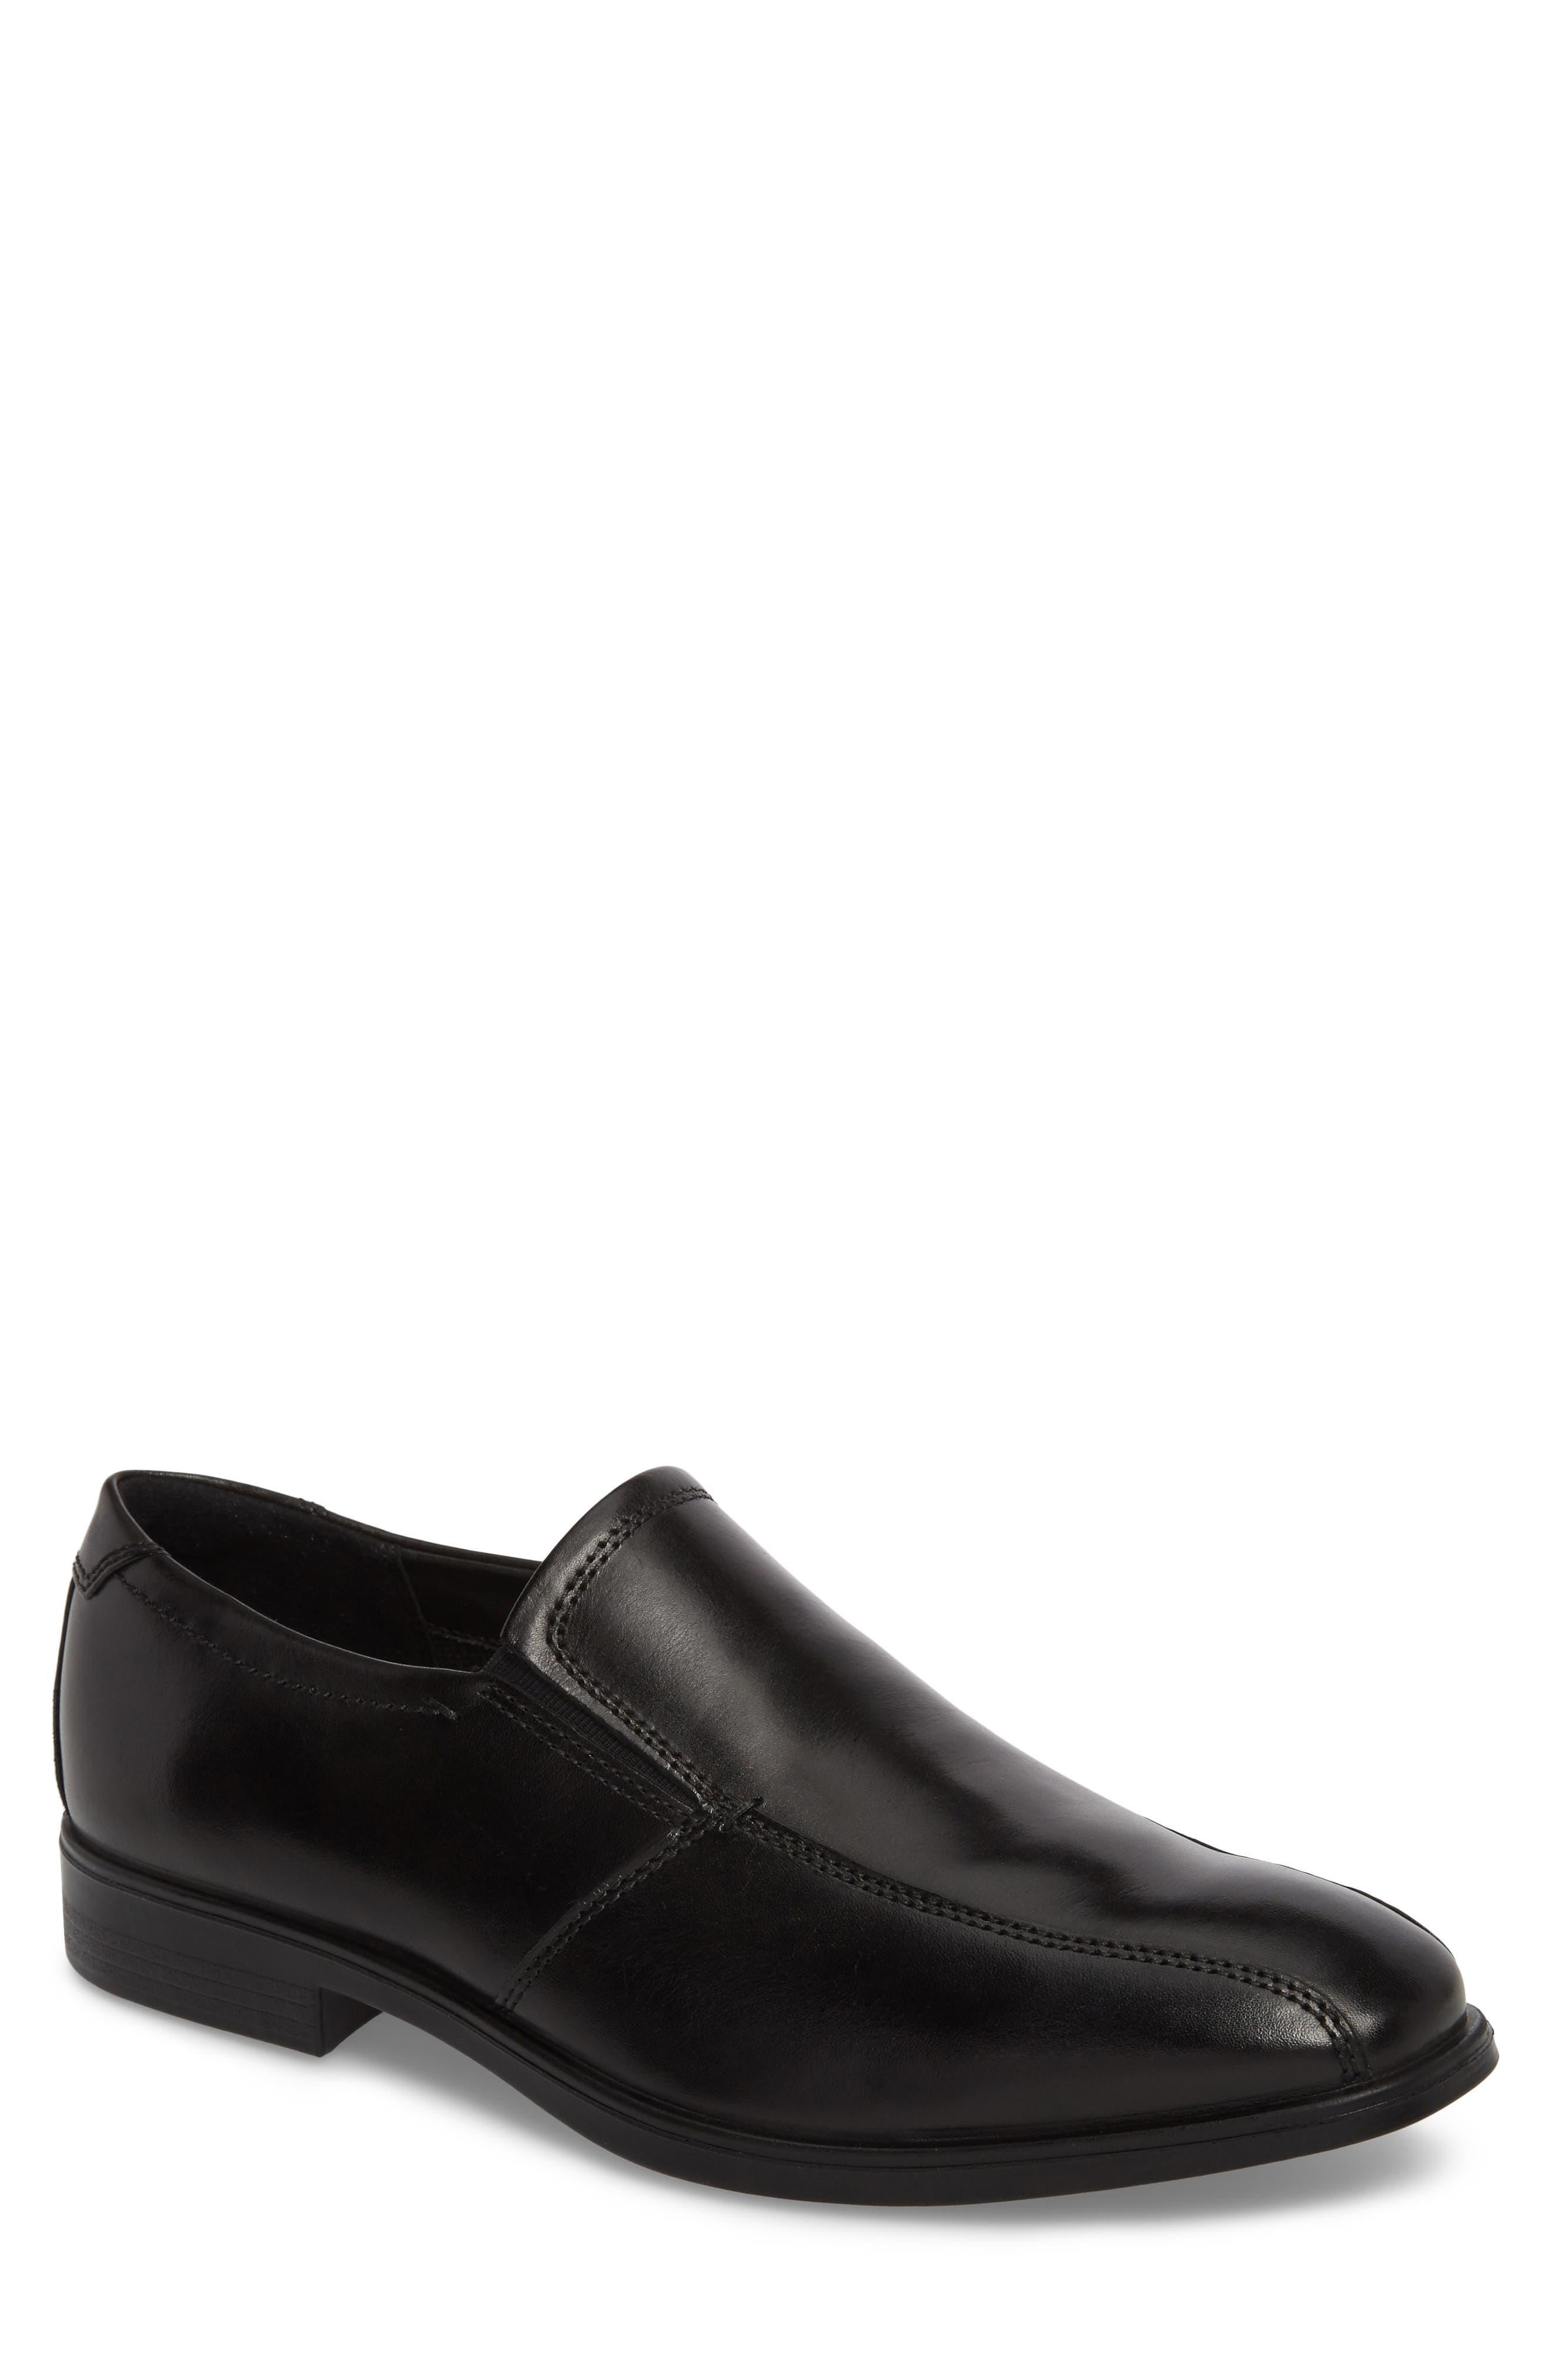 Melbourne Venetian Loafer,                             Main thumbnail 1, color,                             BLACK LEATHER